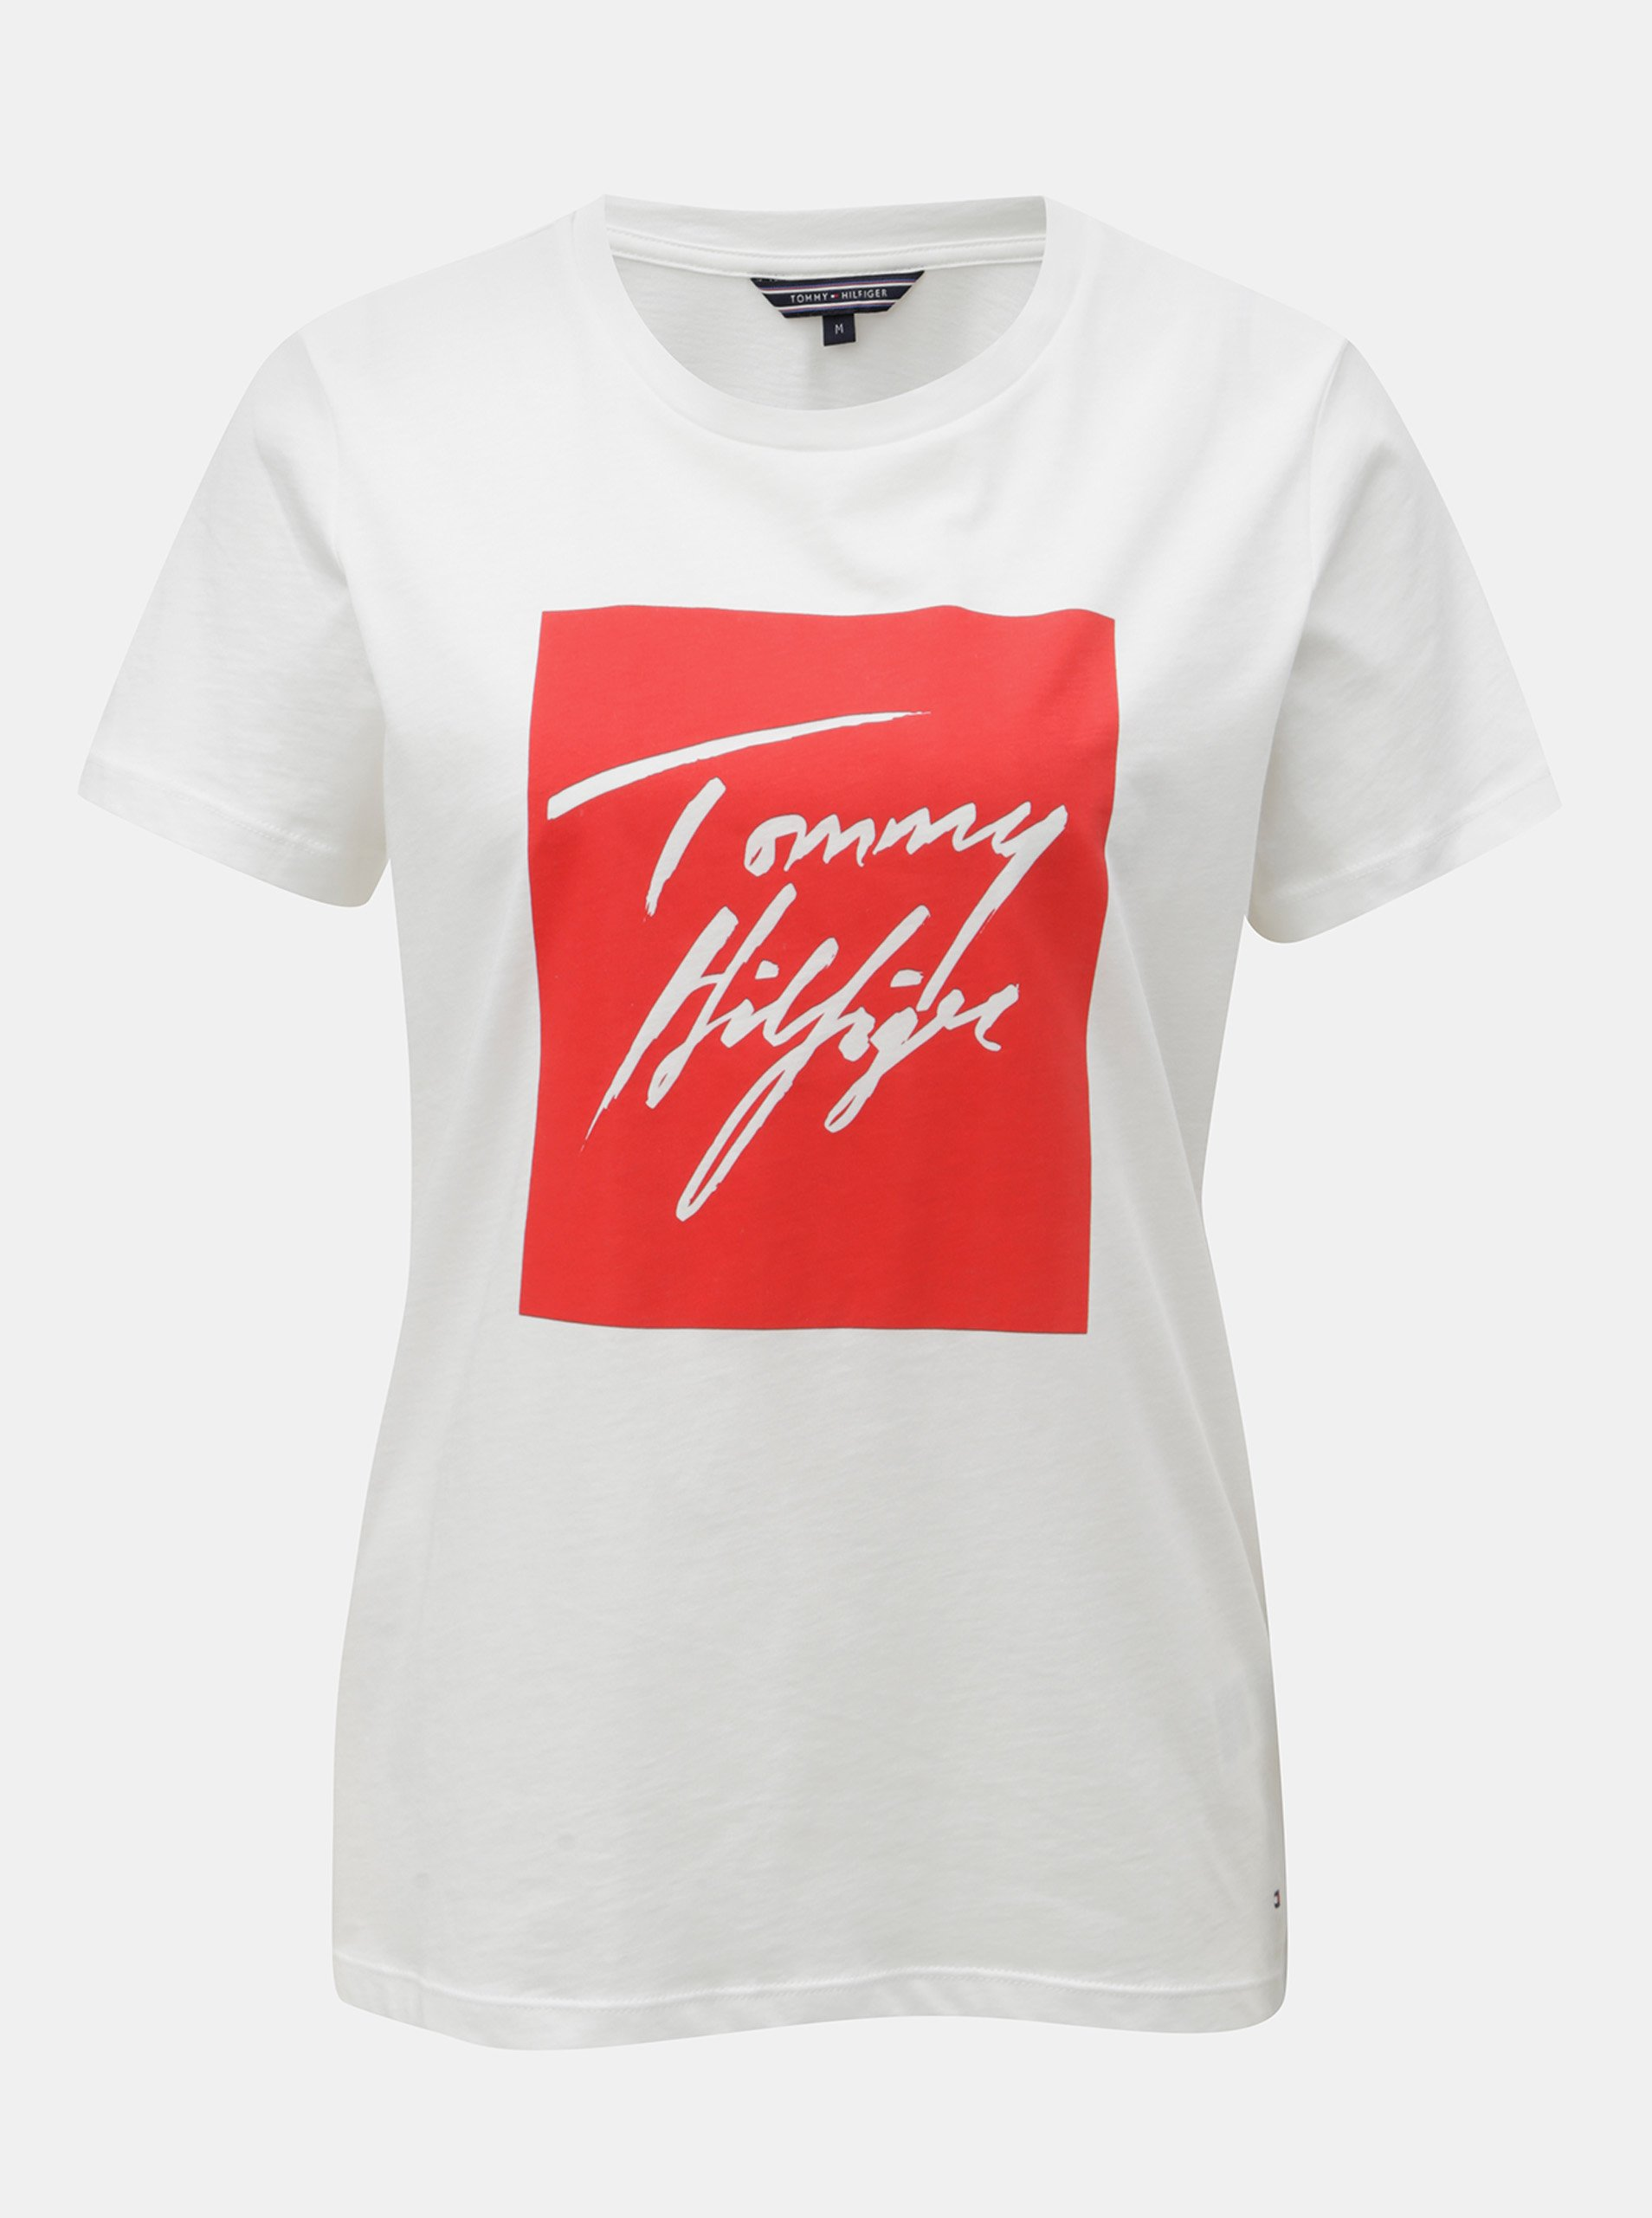 69f39be9b12e Biele dámske tričko s potlačou Tommy Hilfiger Effy